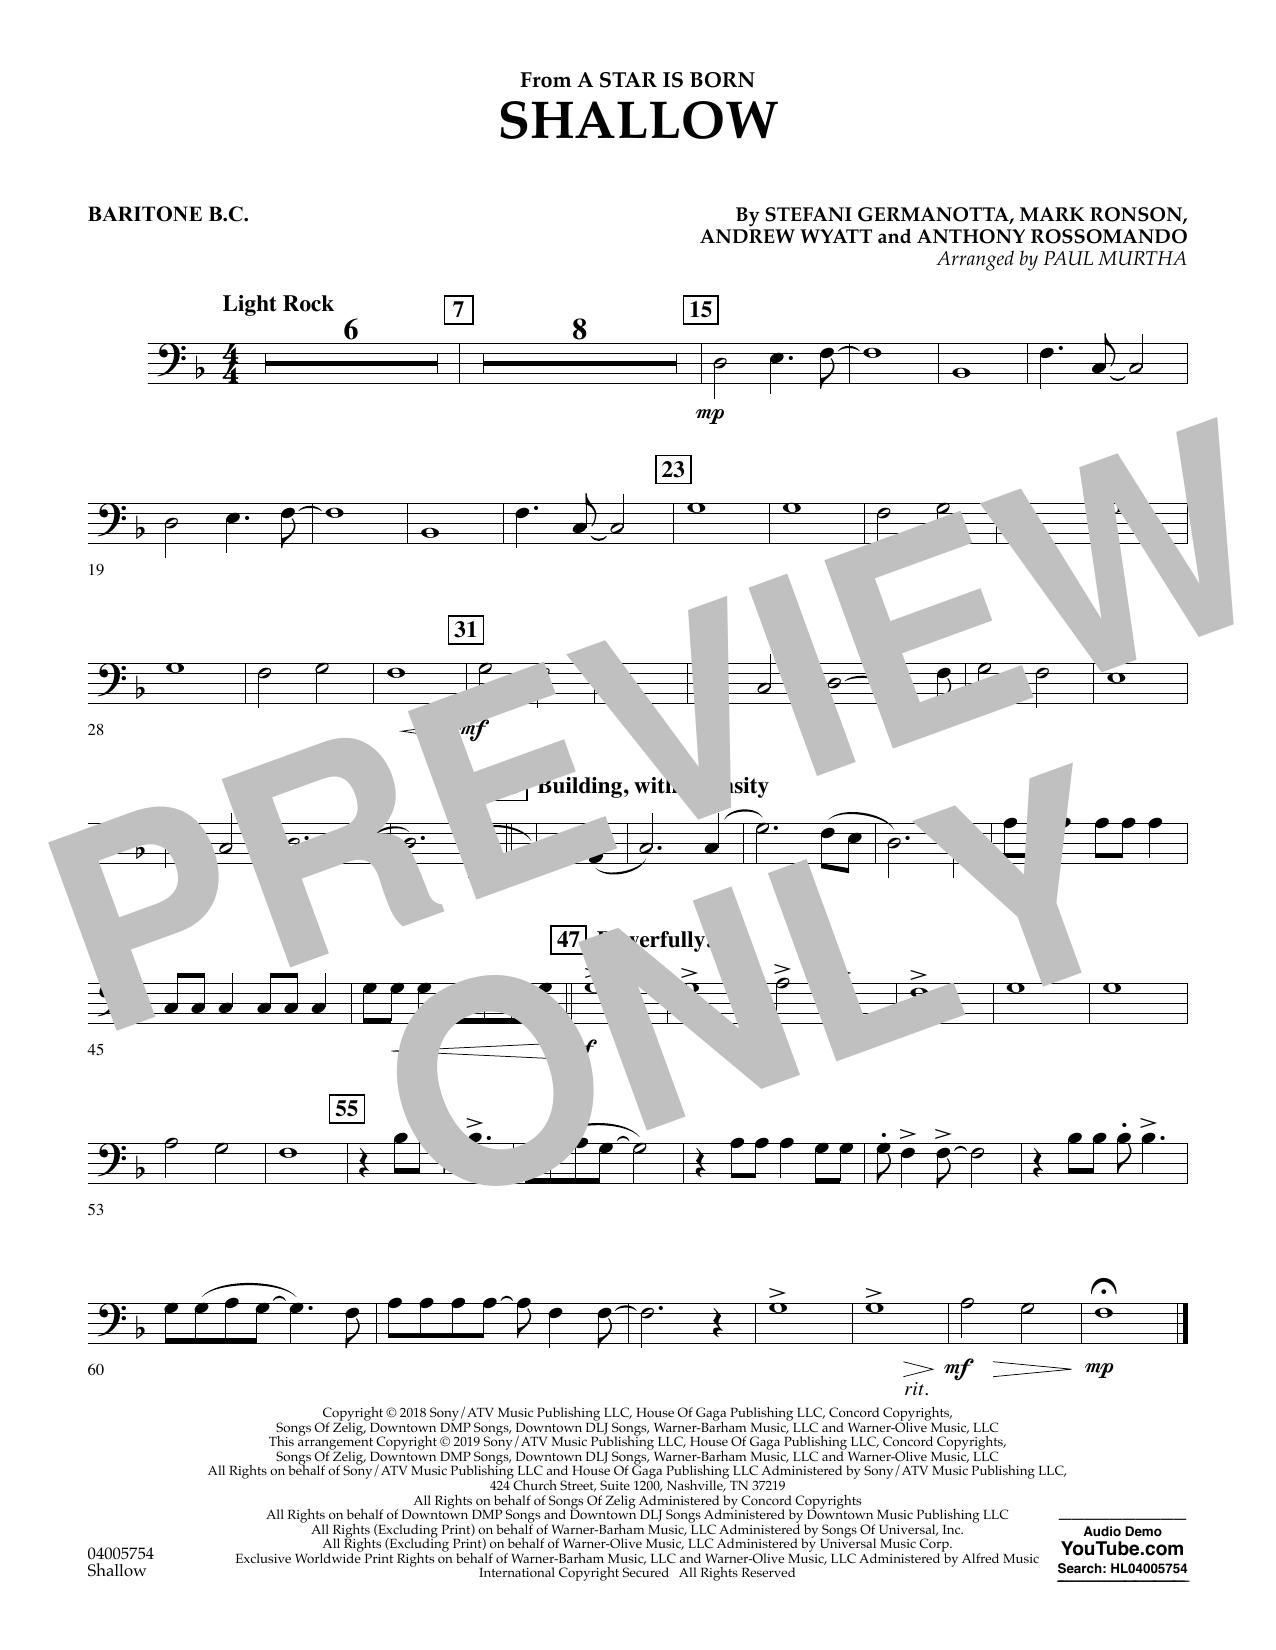 Shallow (from A Star Is Born) (arr. Paul Murtha) - Baritone B.C. (Concert Band)